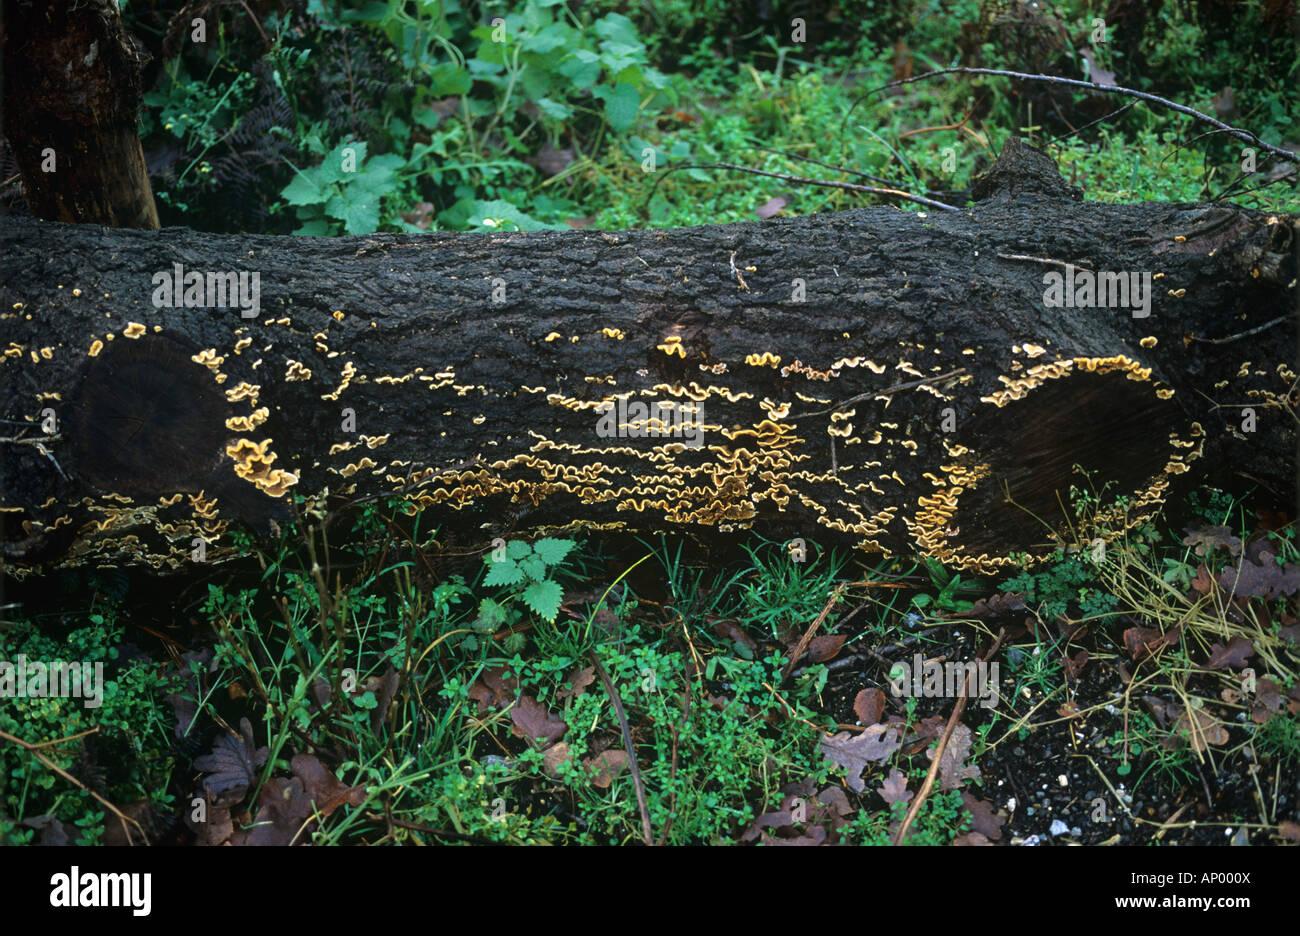 Saprophytic fungus Stereum hirsutum fruiting bodies on dead tree trunk - Stock Image